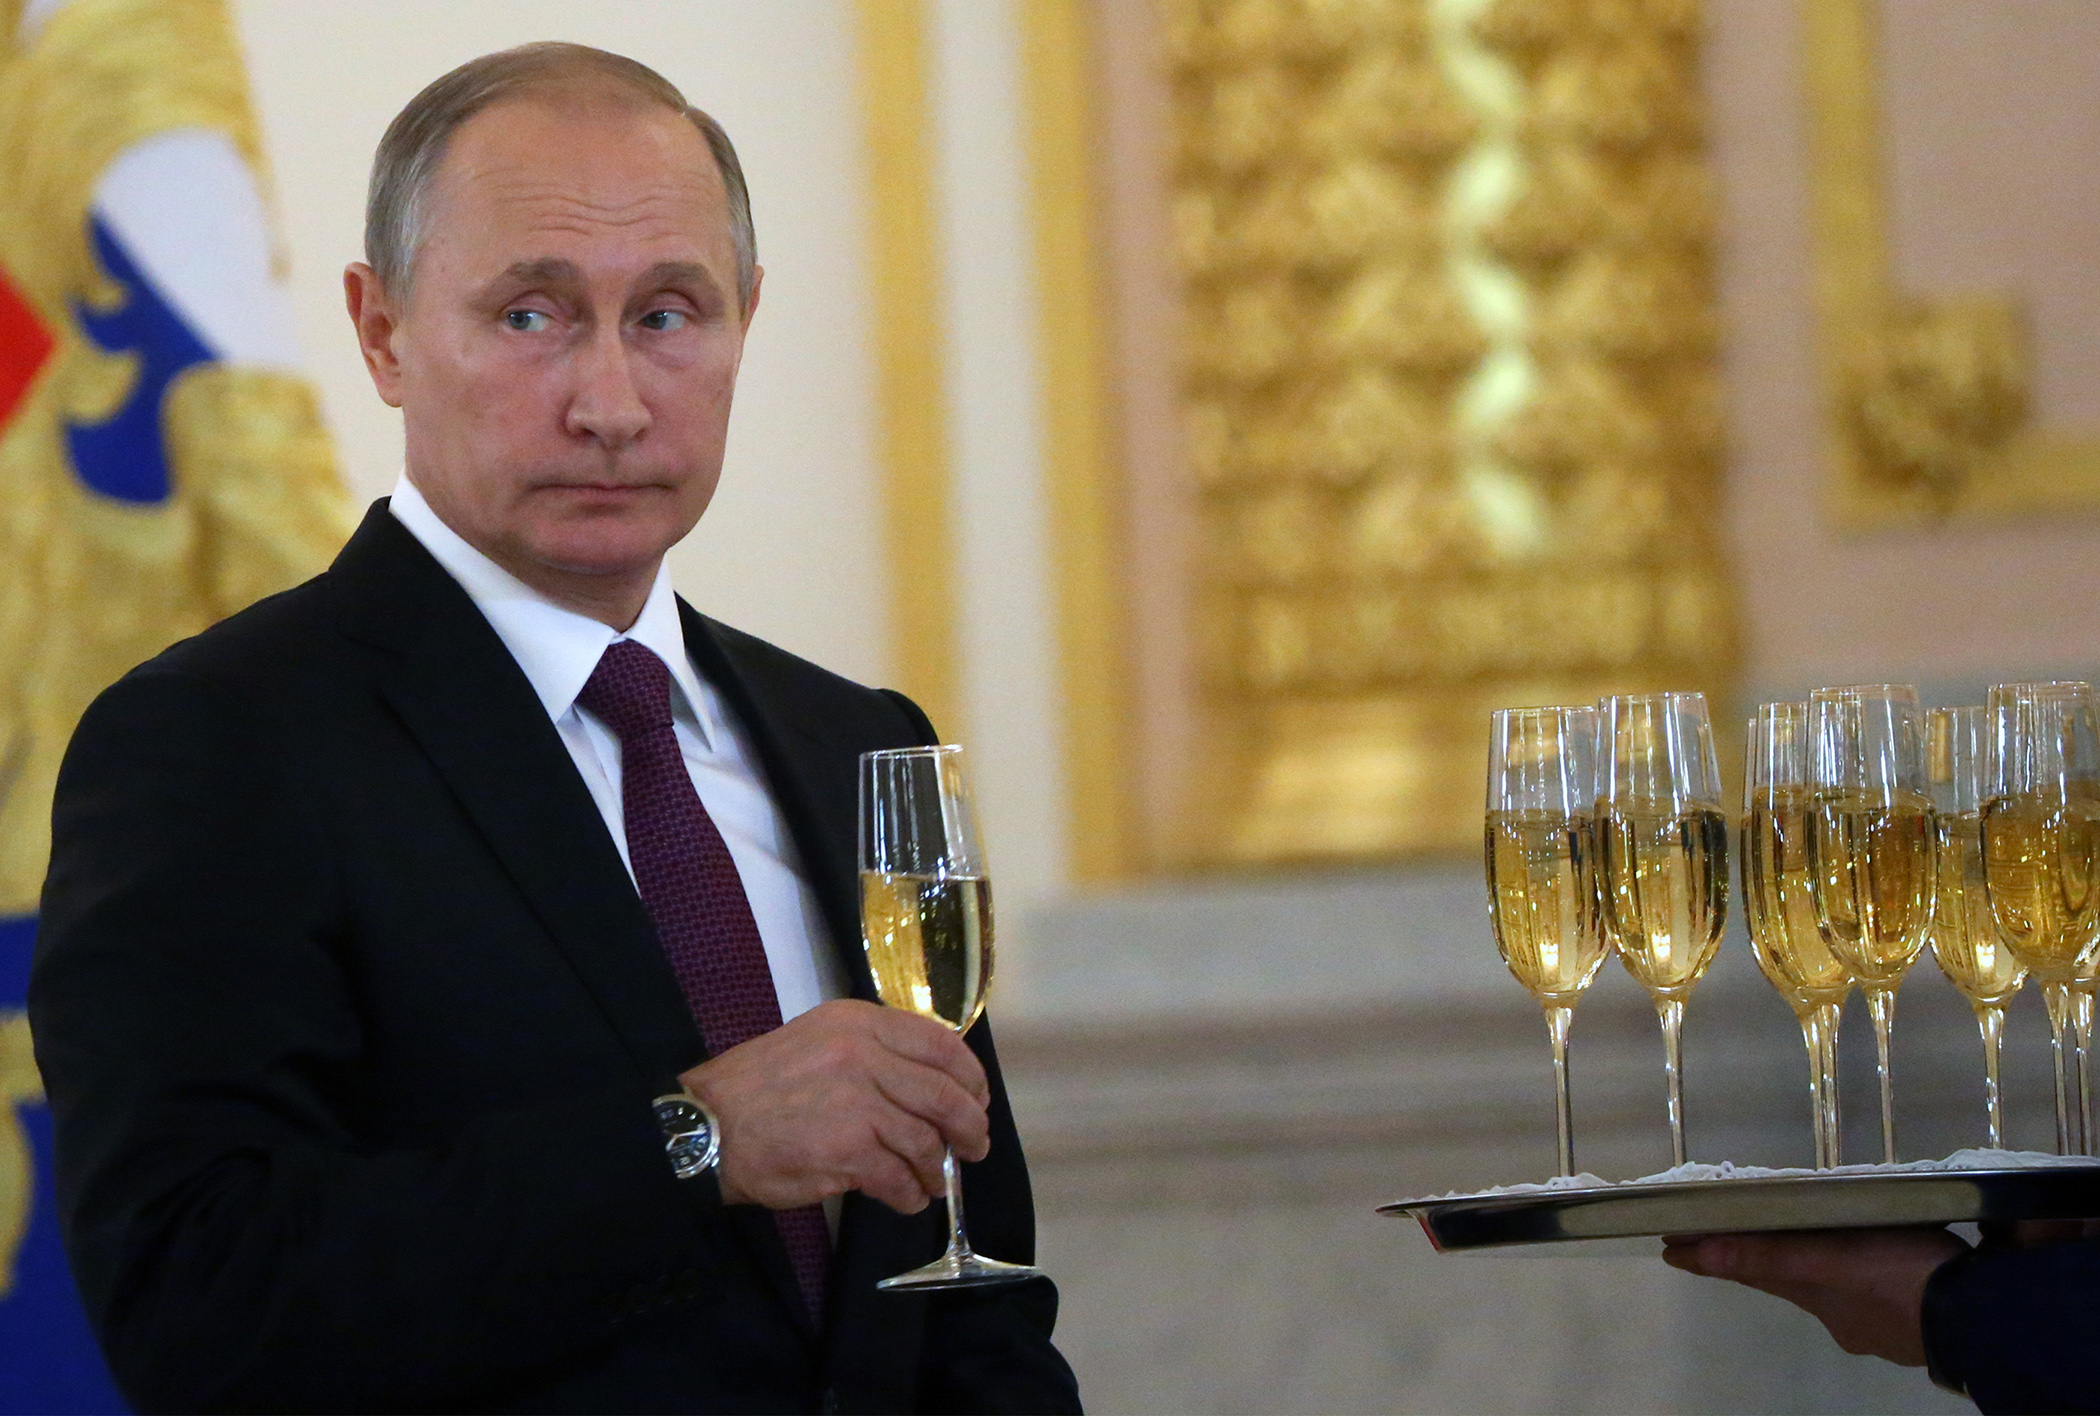 Putin Drinking Champagne